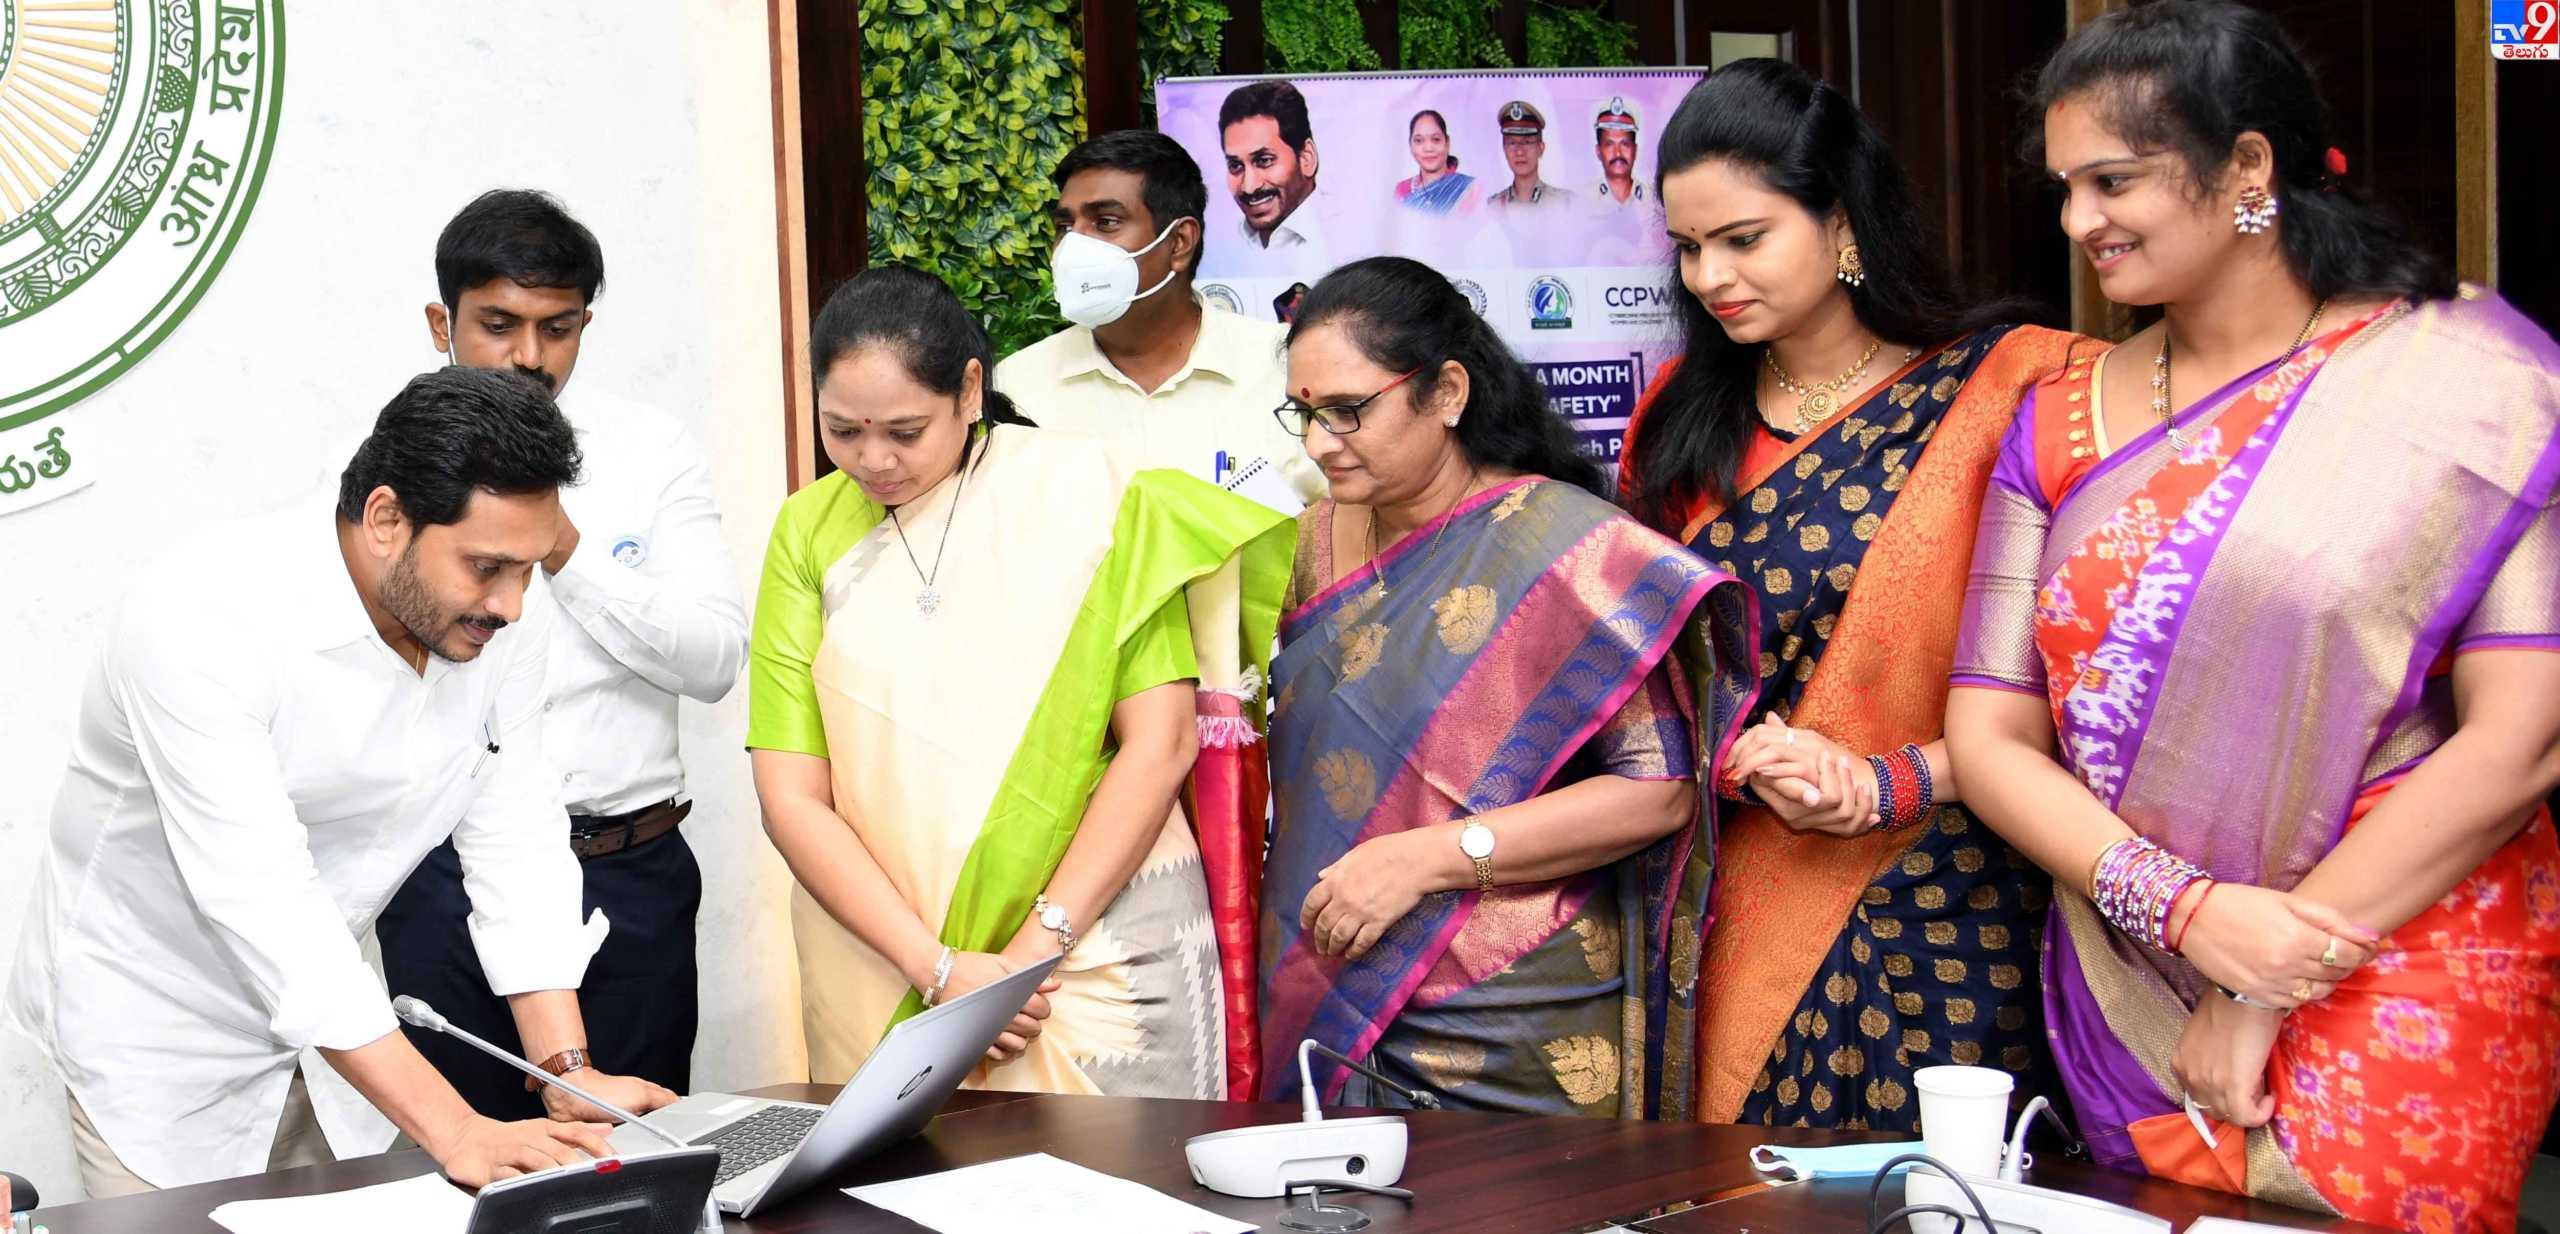 E-Raksha Bandhan, ఈ- రక్షాబంధన్' ప్రారంభించిన సీఎం జగన్